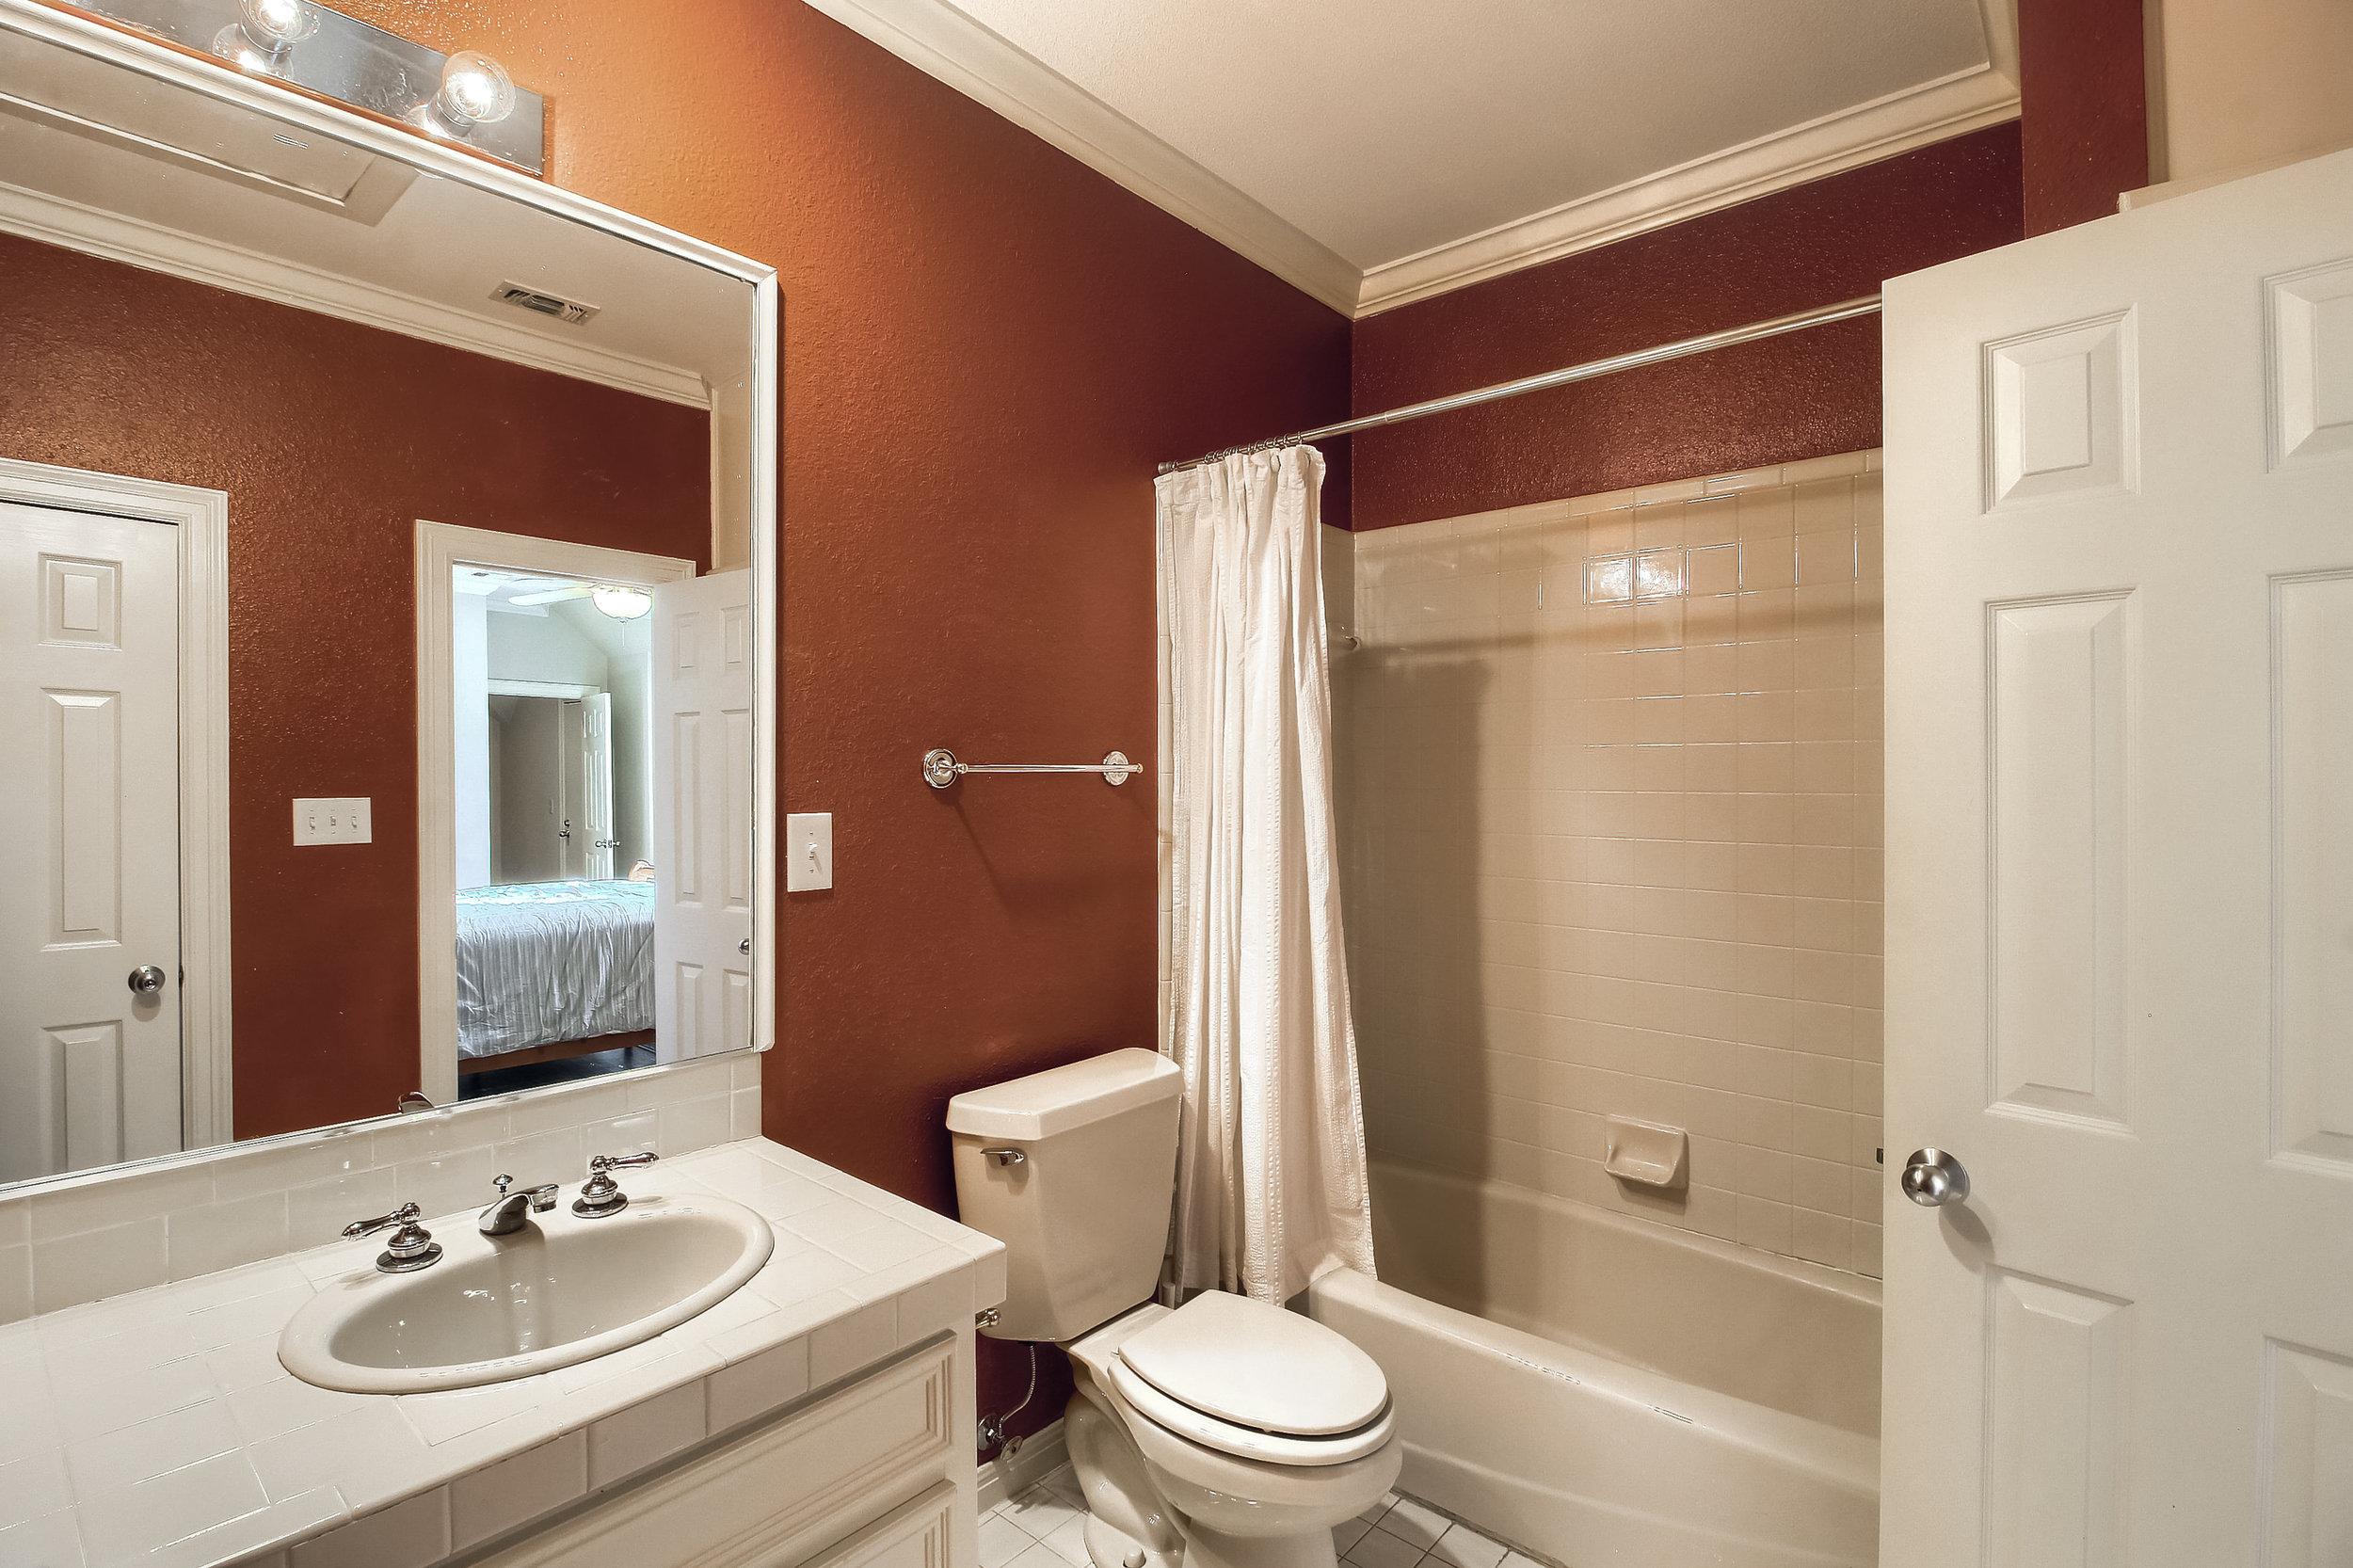 07_Bathroom_IMG_0242.JPG